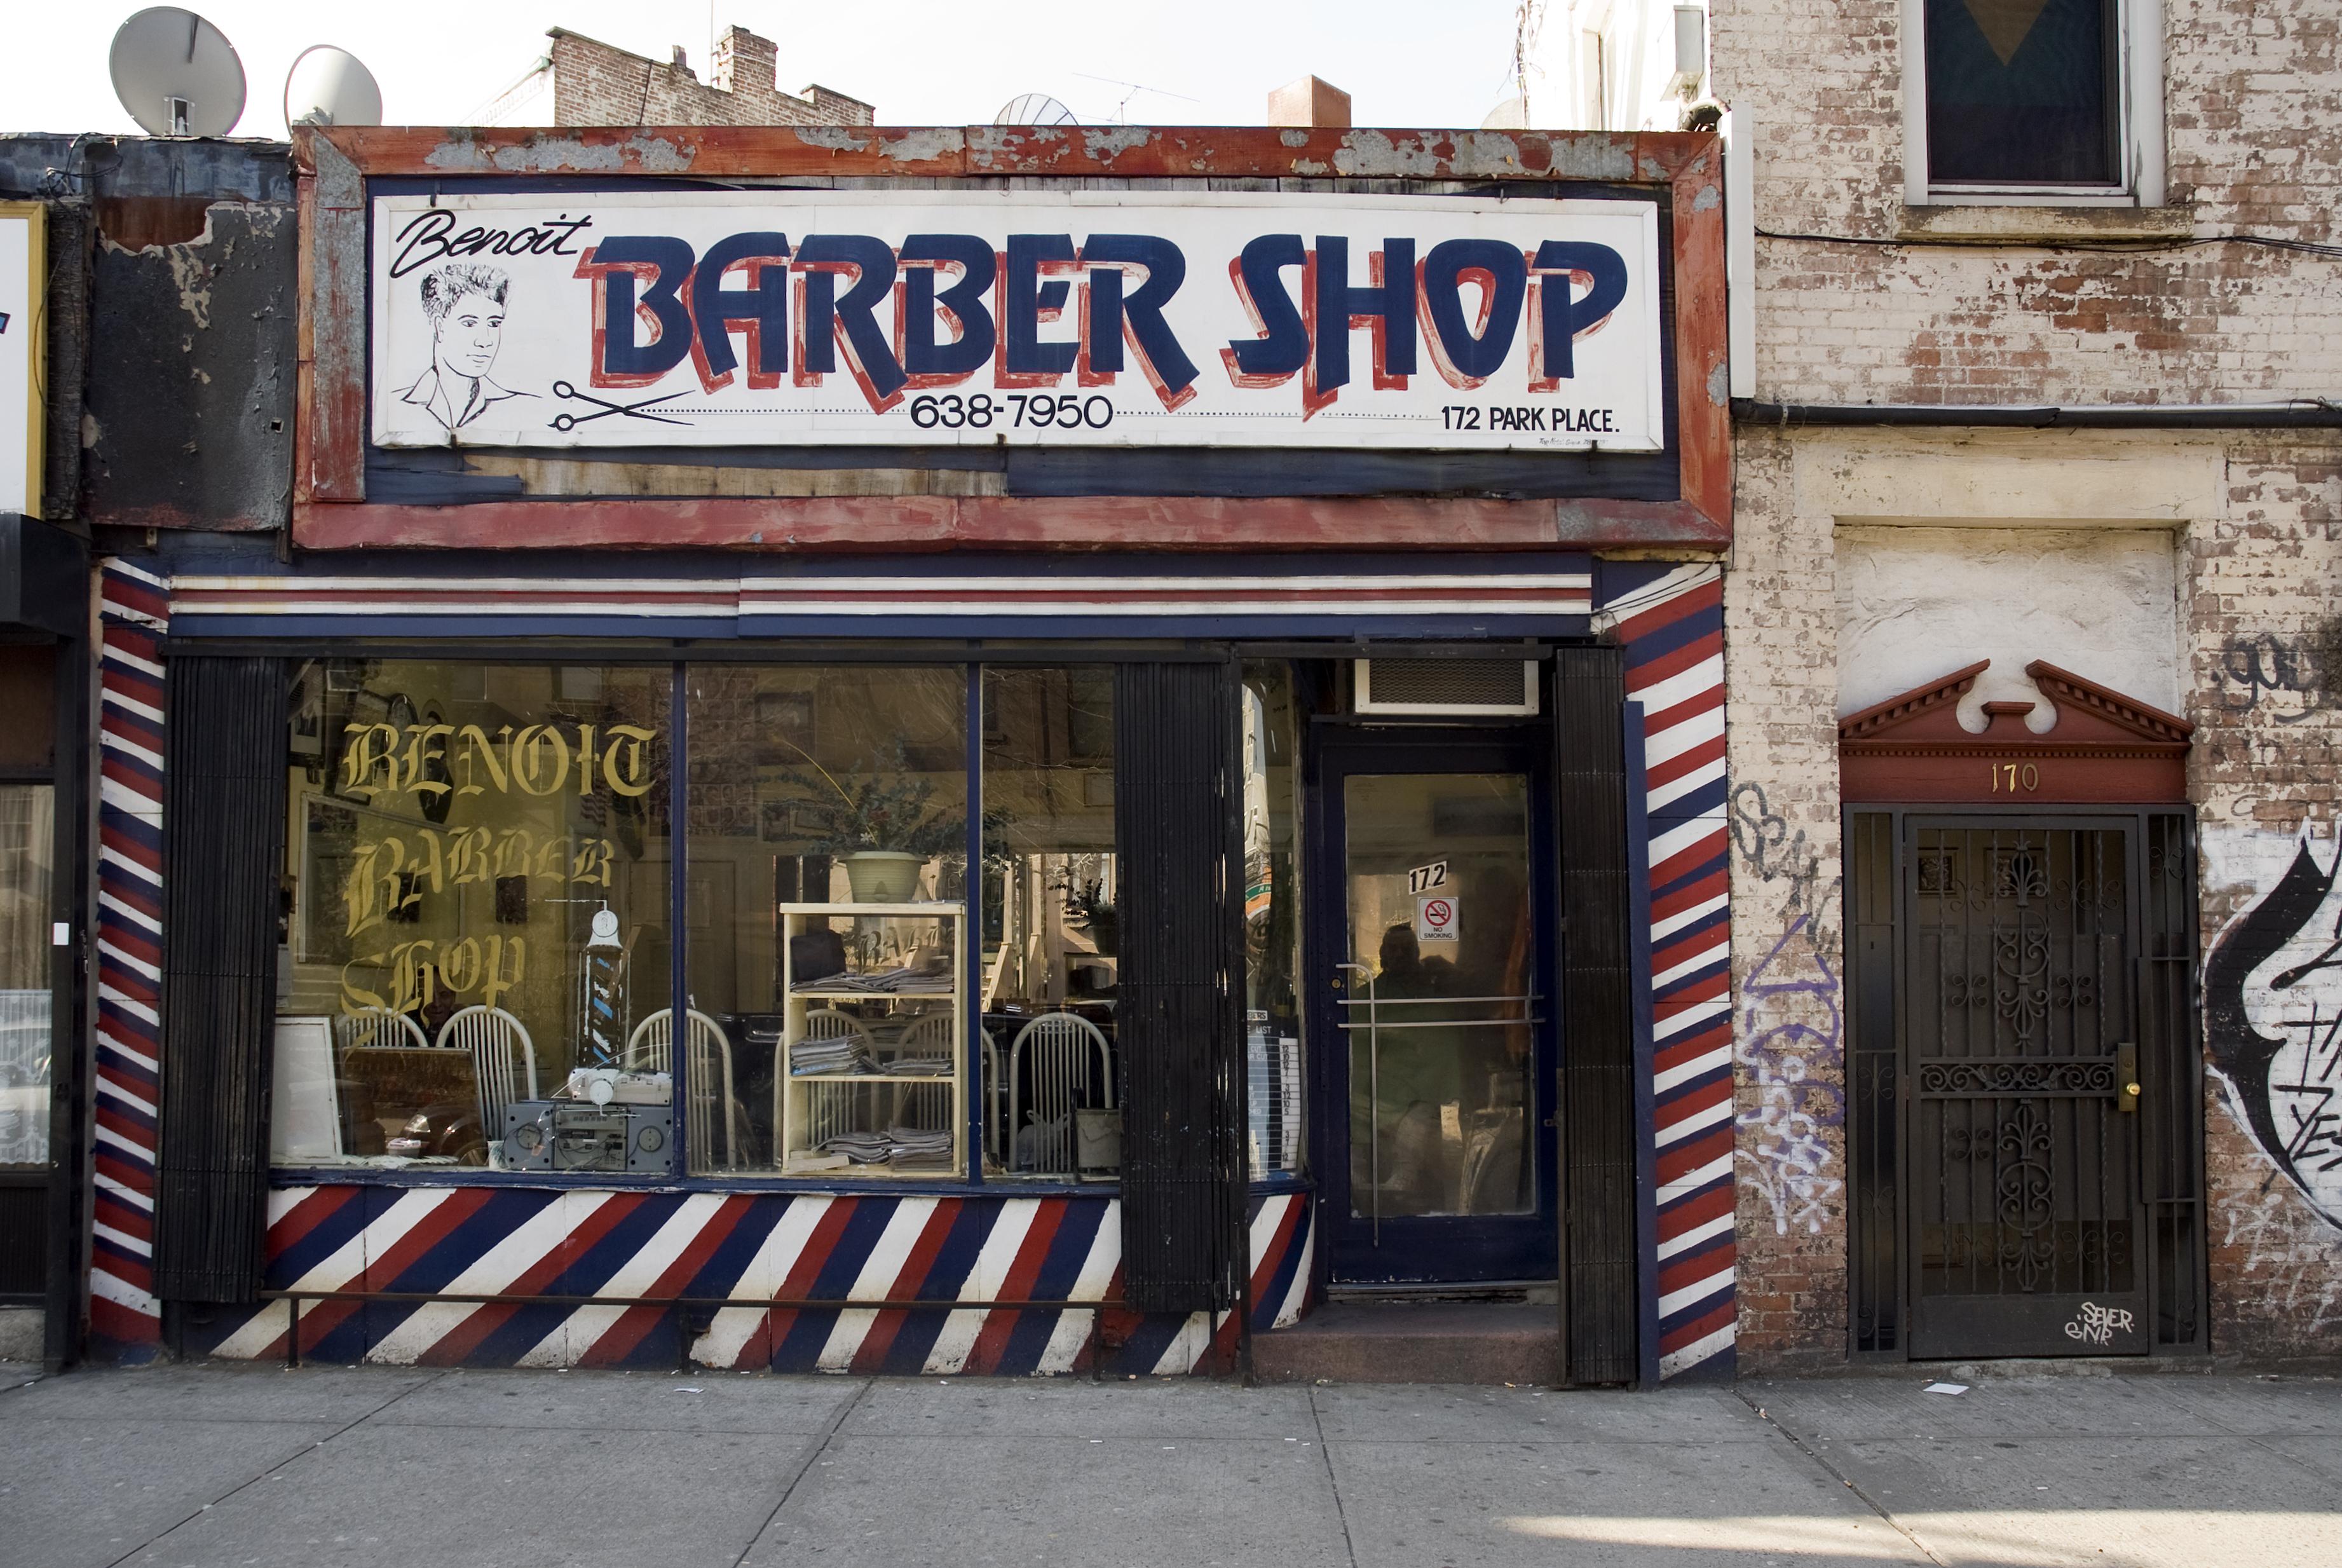 Benoit Barber Shop Flickr - Photo Sharing!